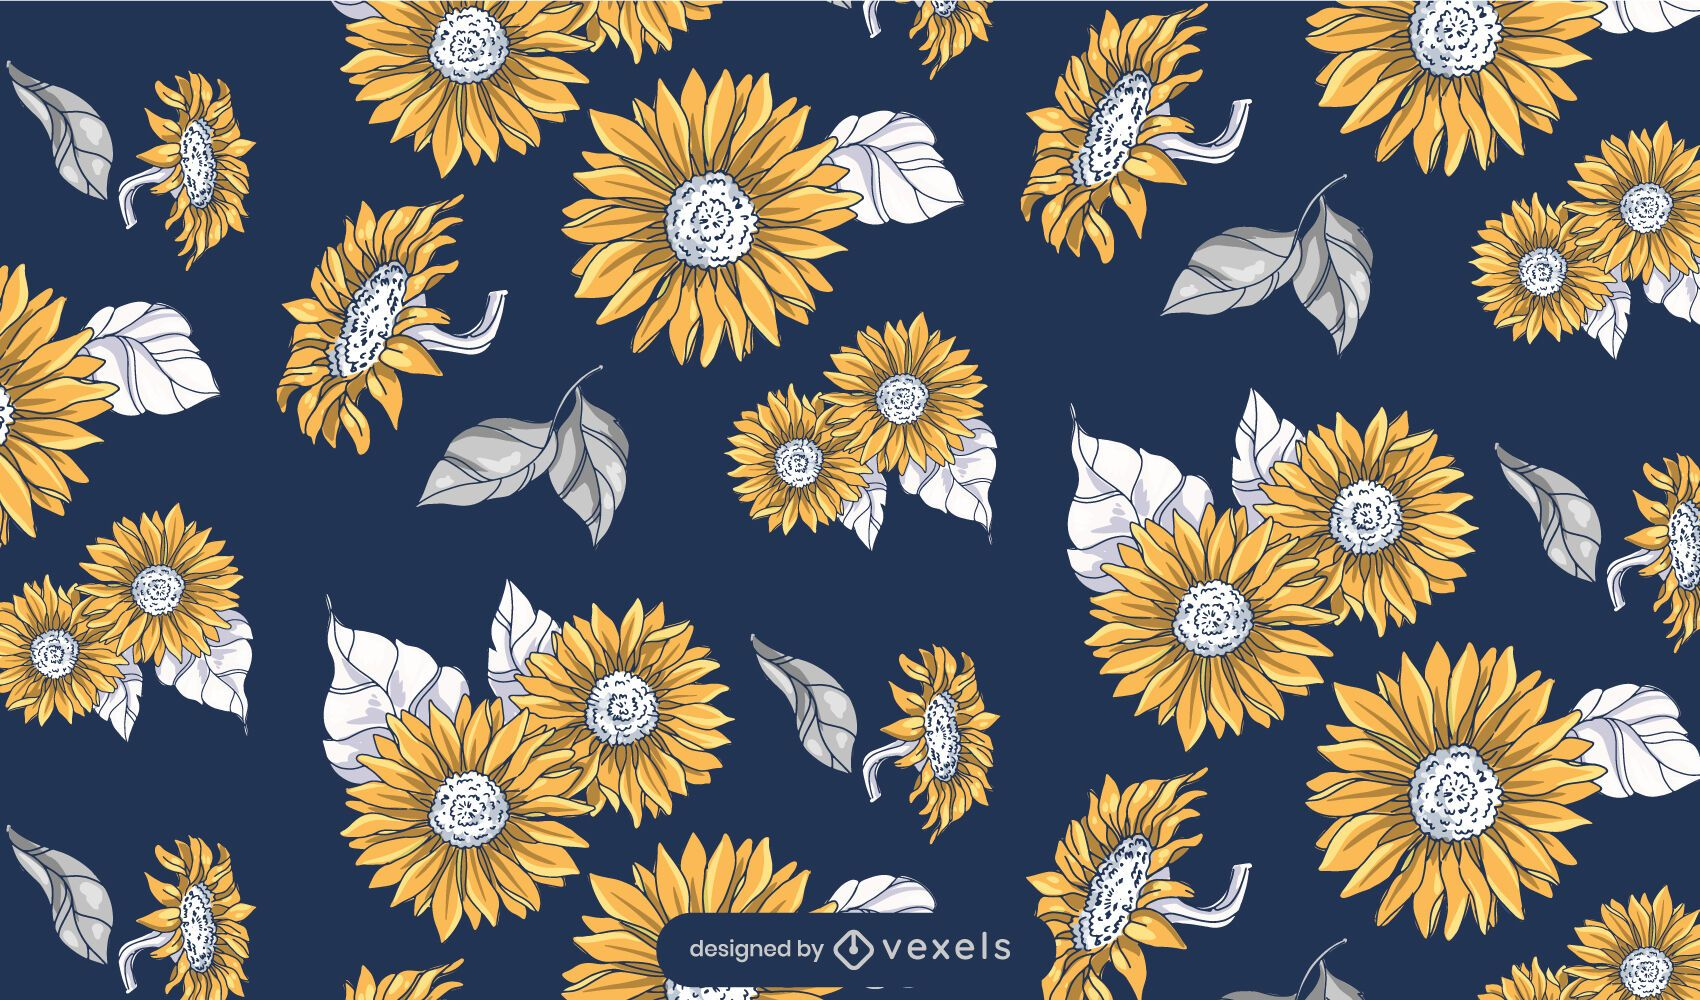 Sunflowers pattern design